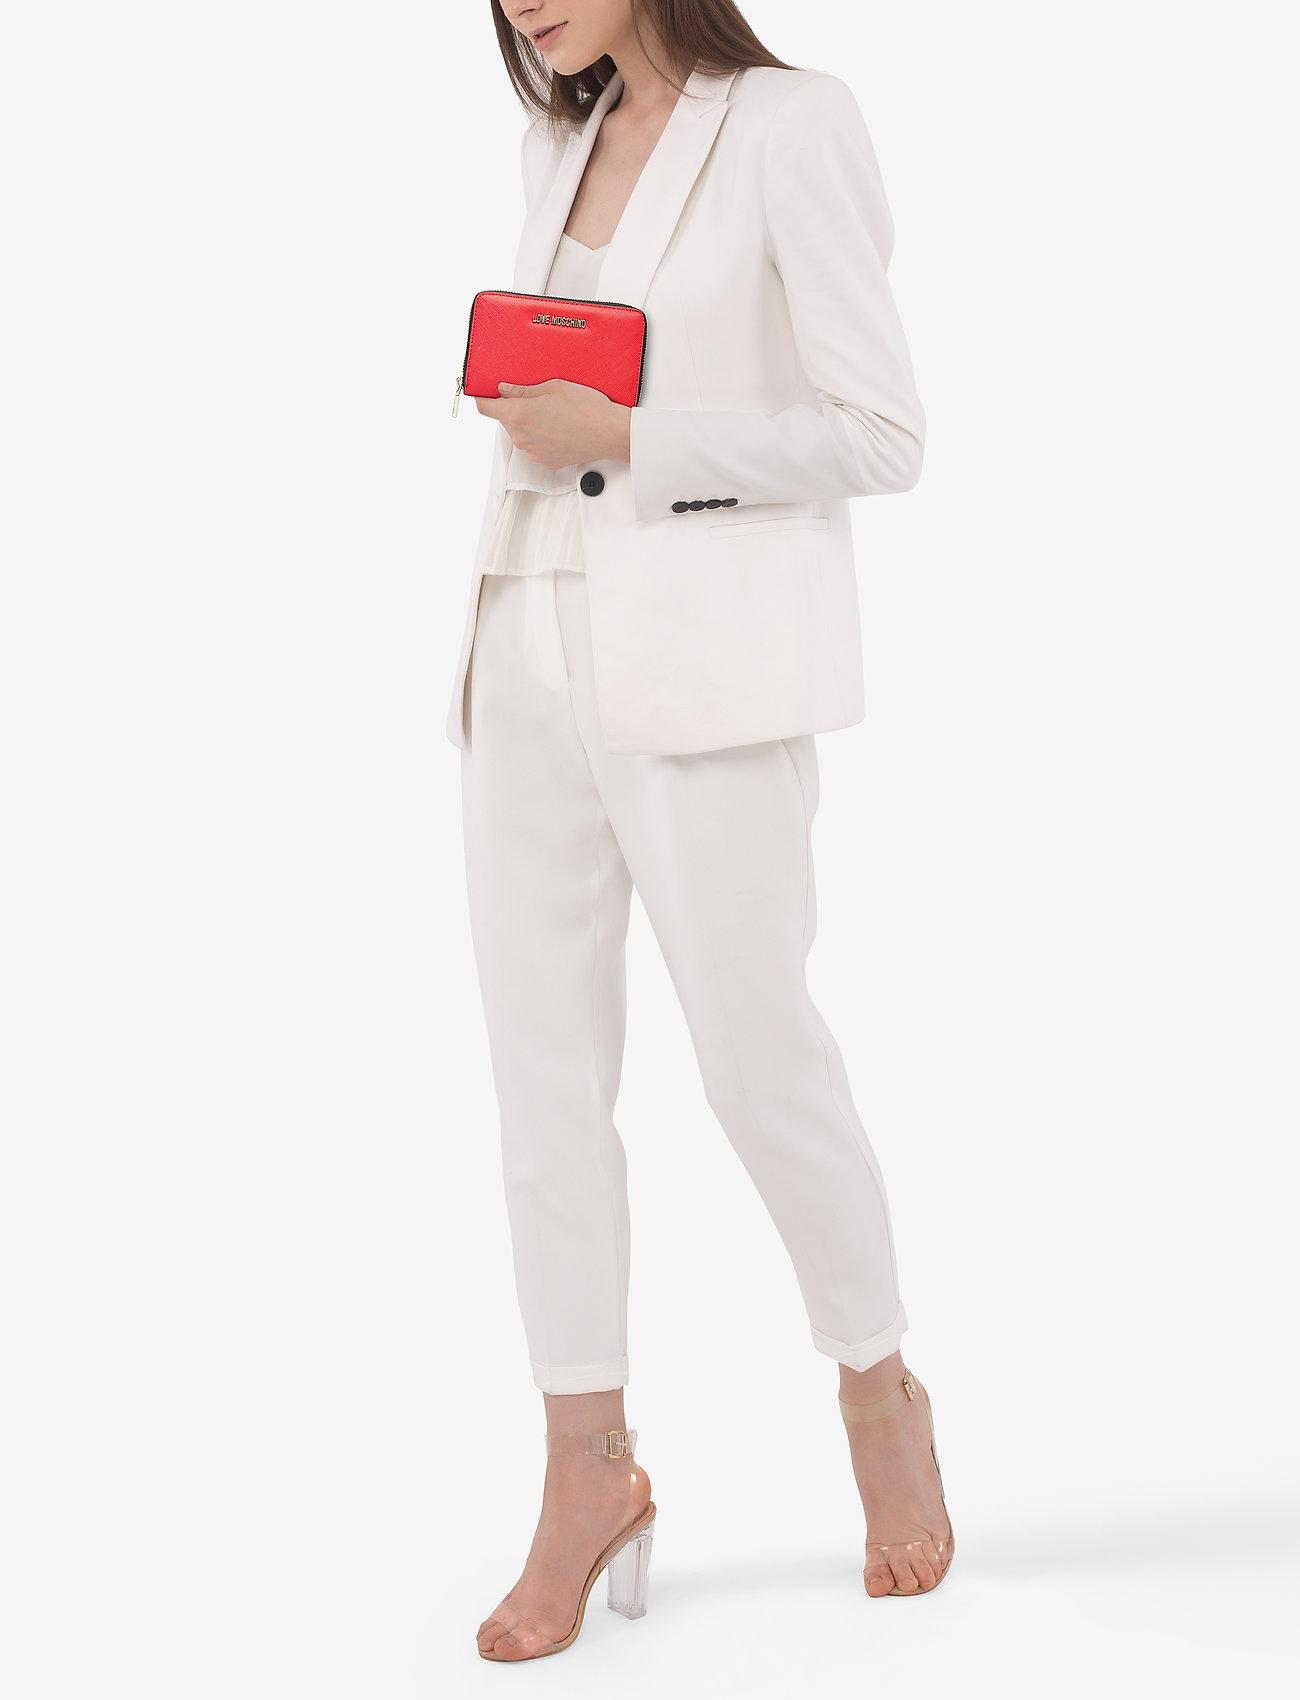 Love Moschino Bags SLG-LOVE MOSCHINO - RED